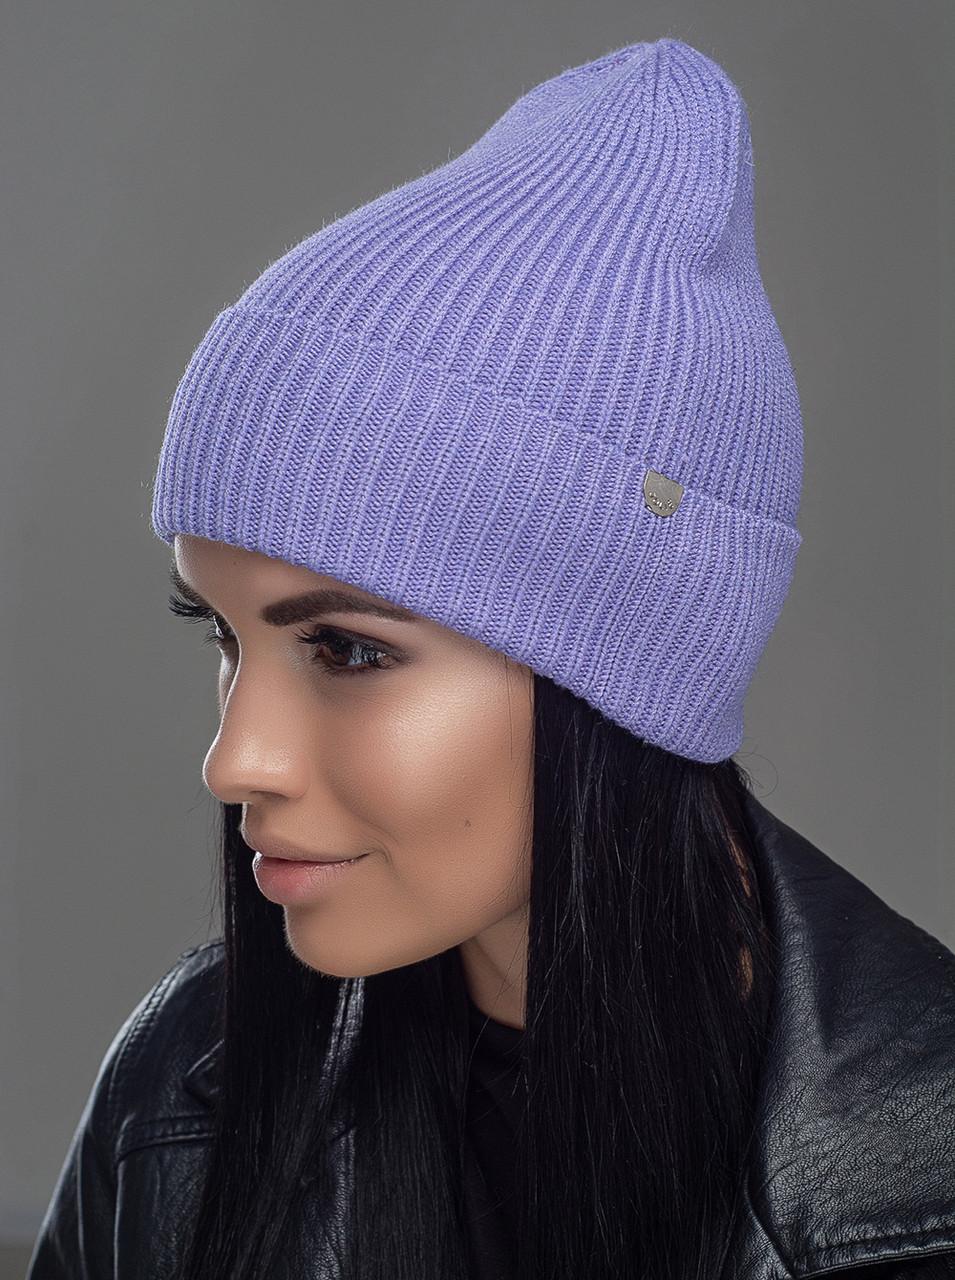 Шапка мужская Leks Йорк светло фиолетовая        ( 20757853 m )